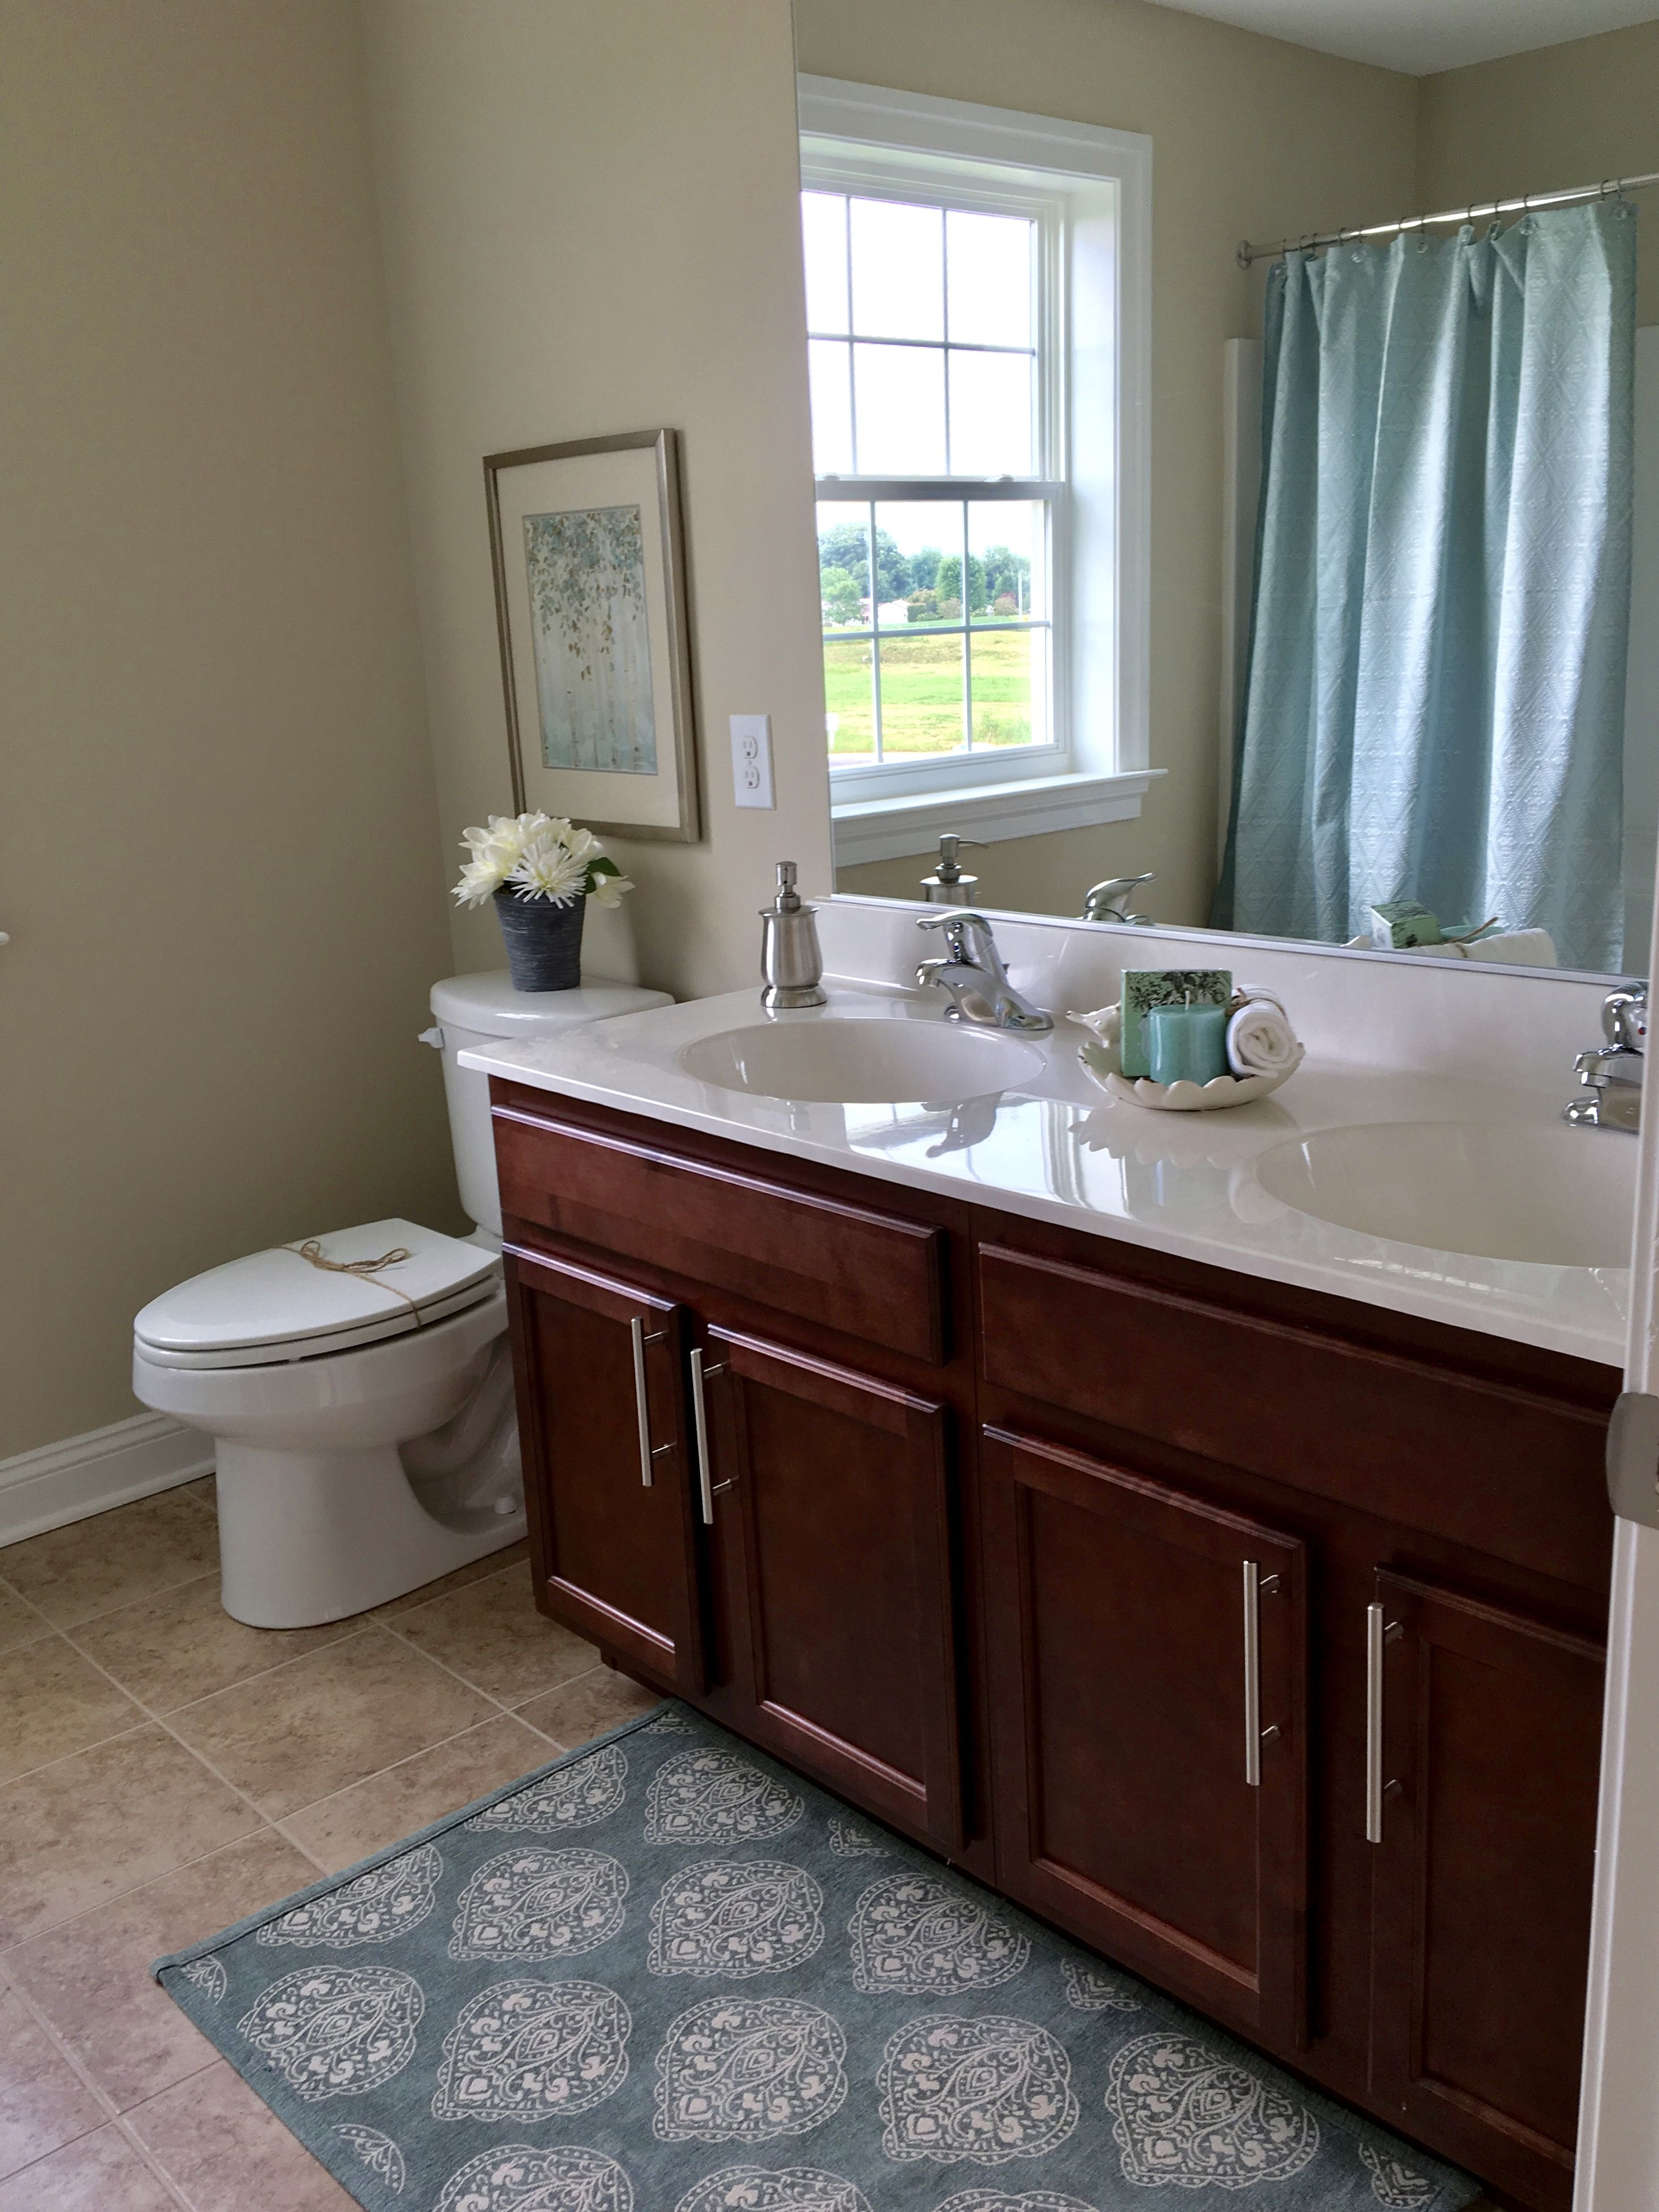 Bathroom featured in The Brandywine By JS Homes in Dover, DE